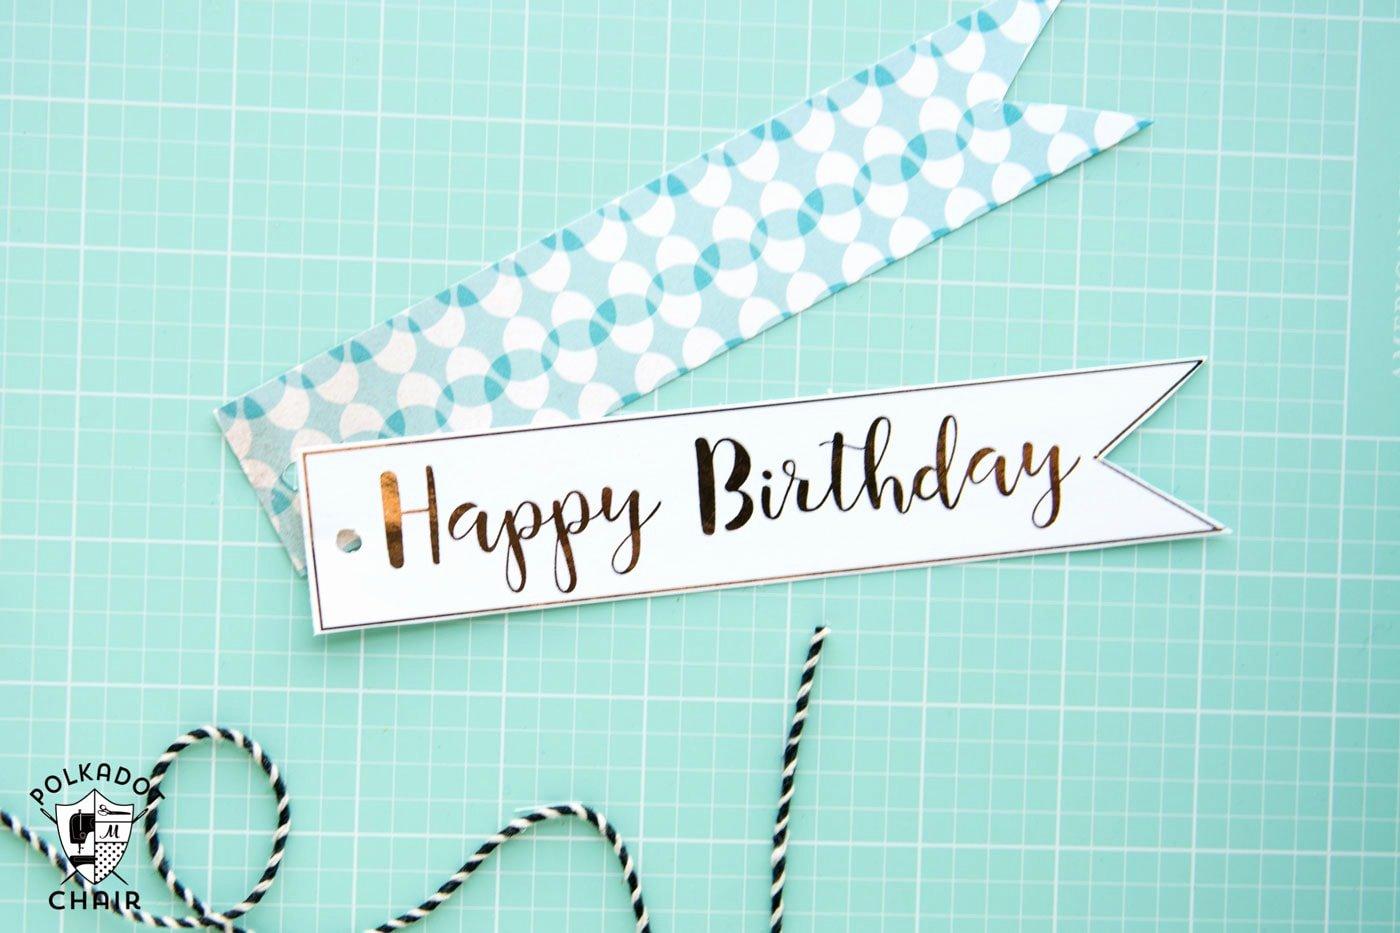 Printable Birthday Gift Tags Elegant Free Printable Bottle Tags the Polka Dot Chair